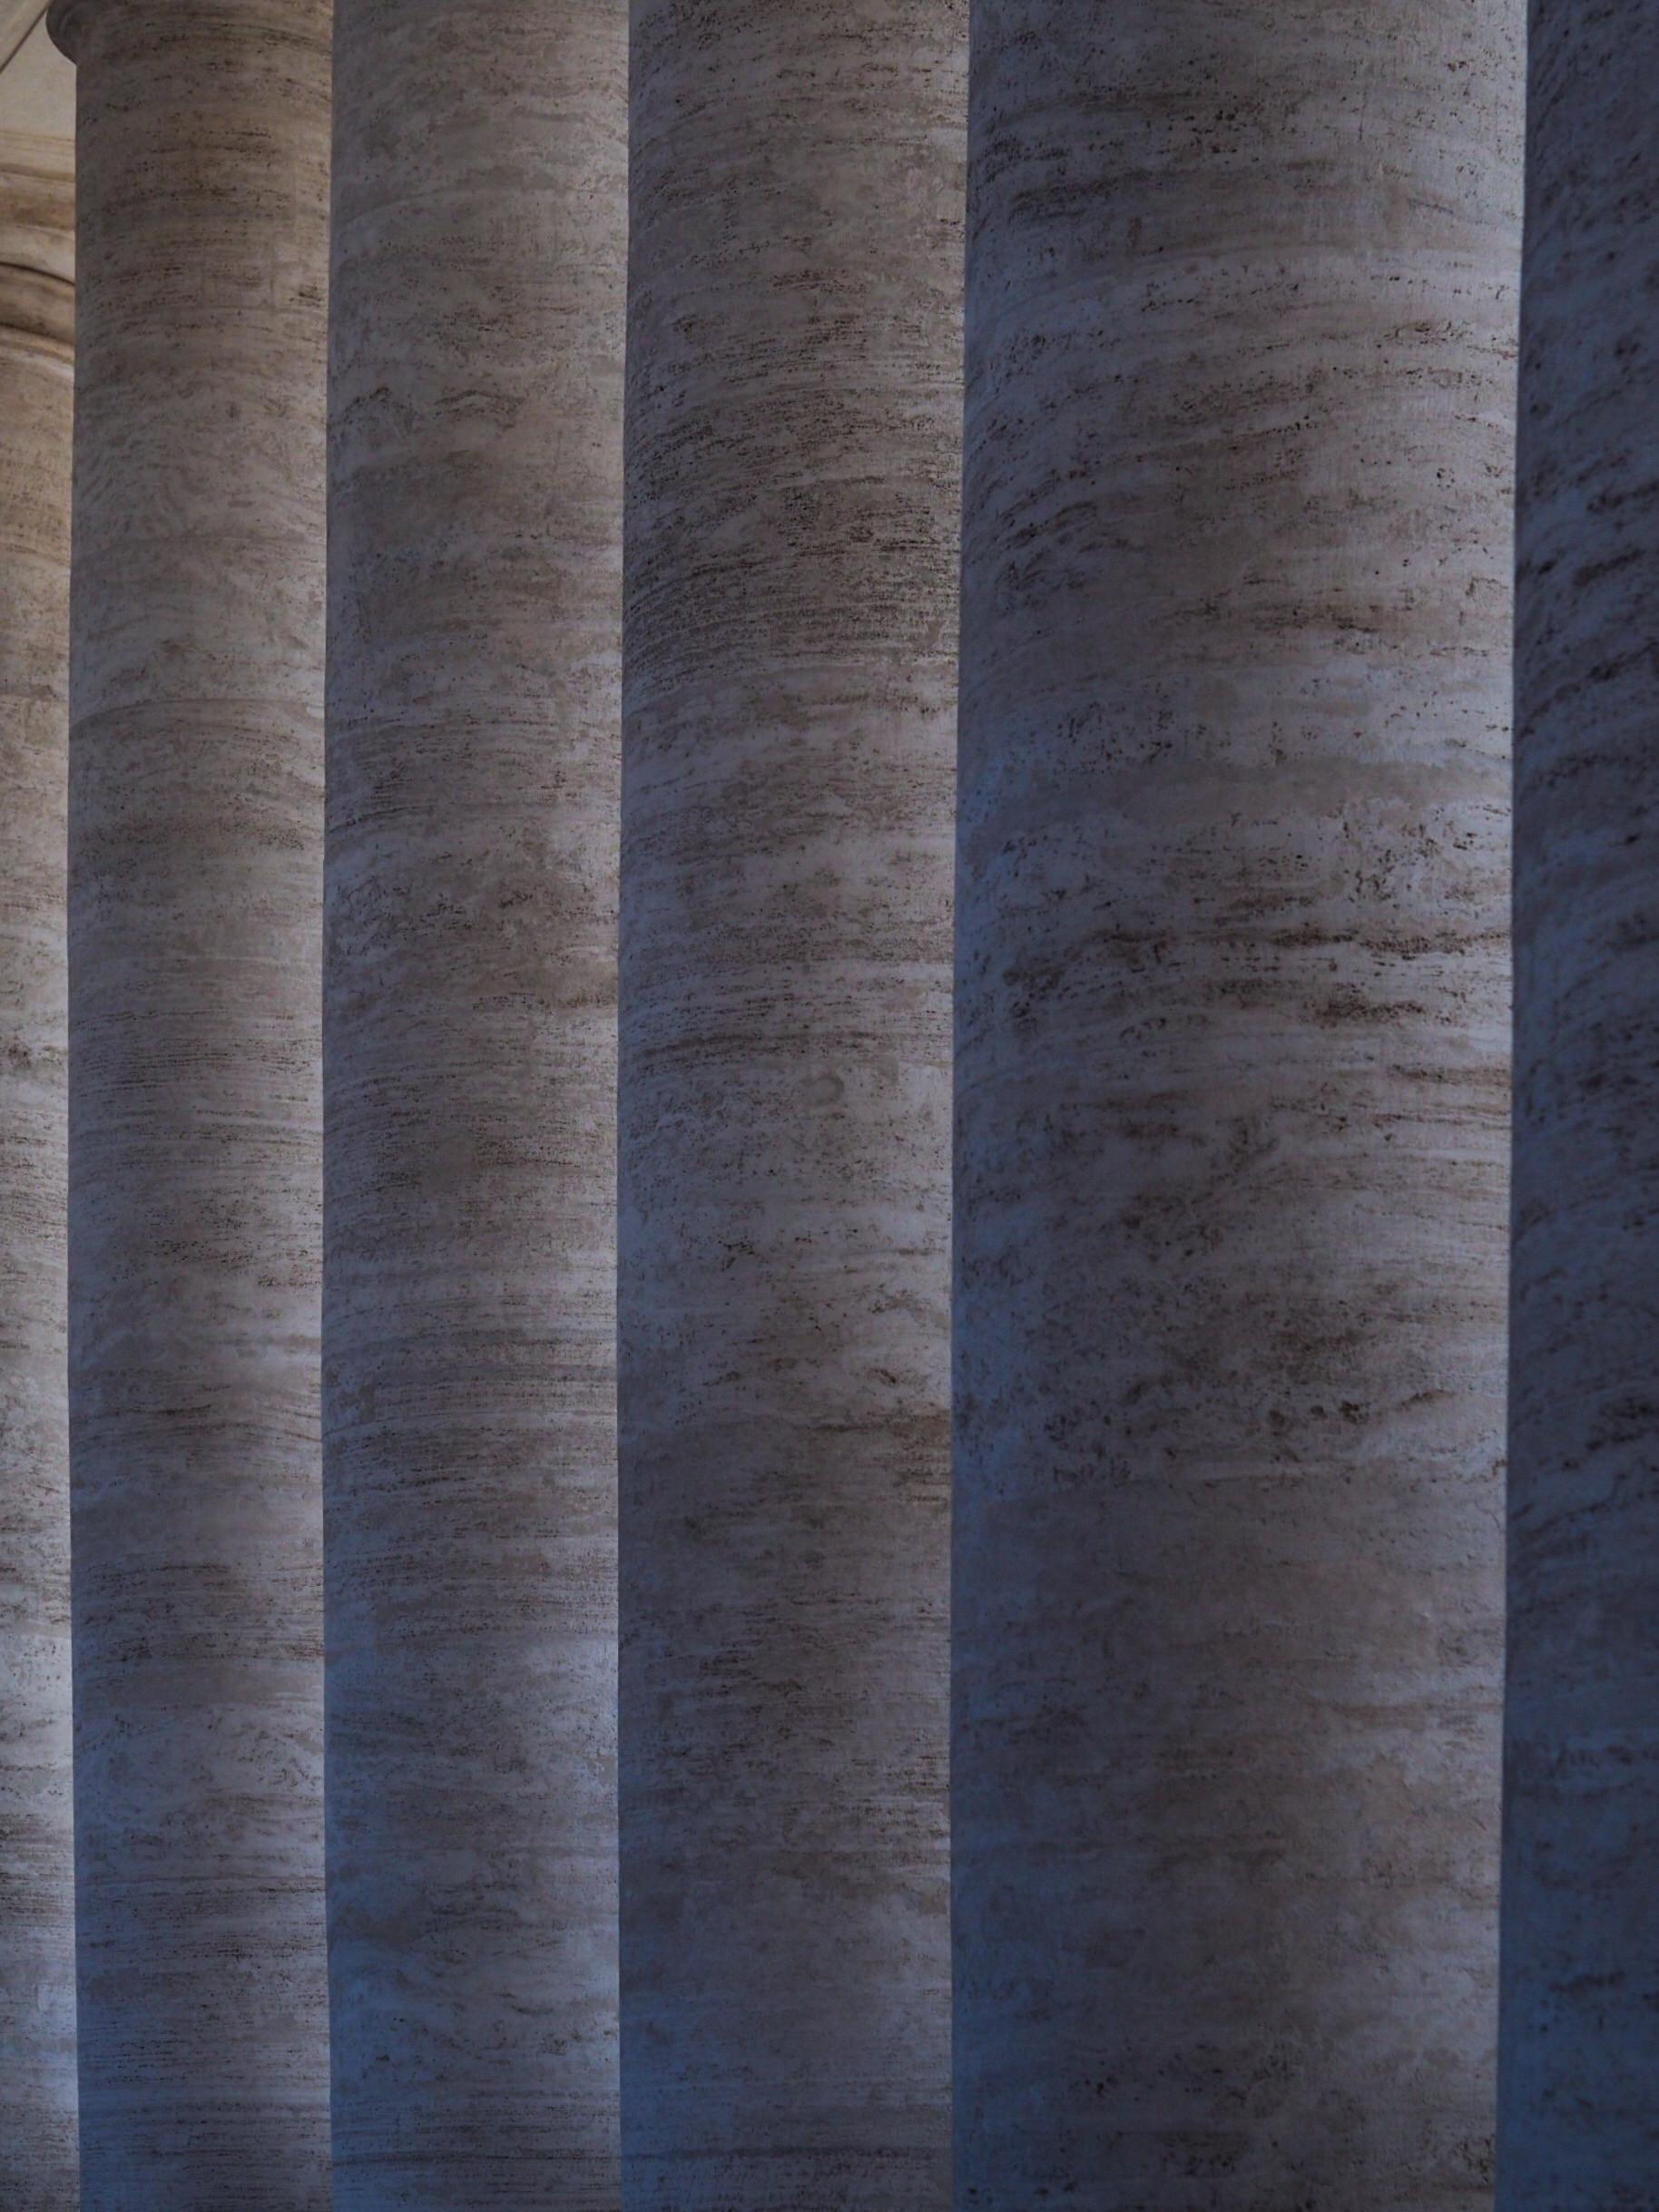 Colonnade - Vatican City